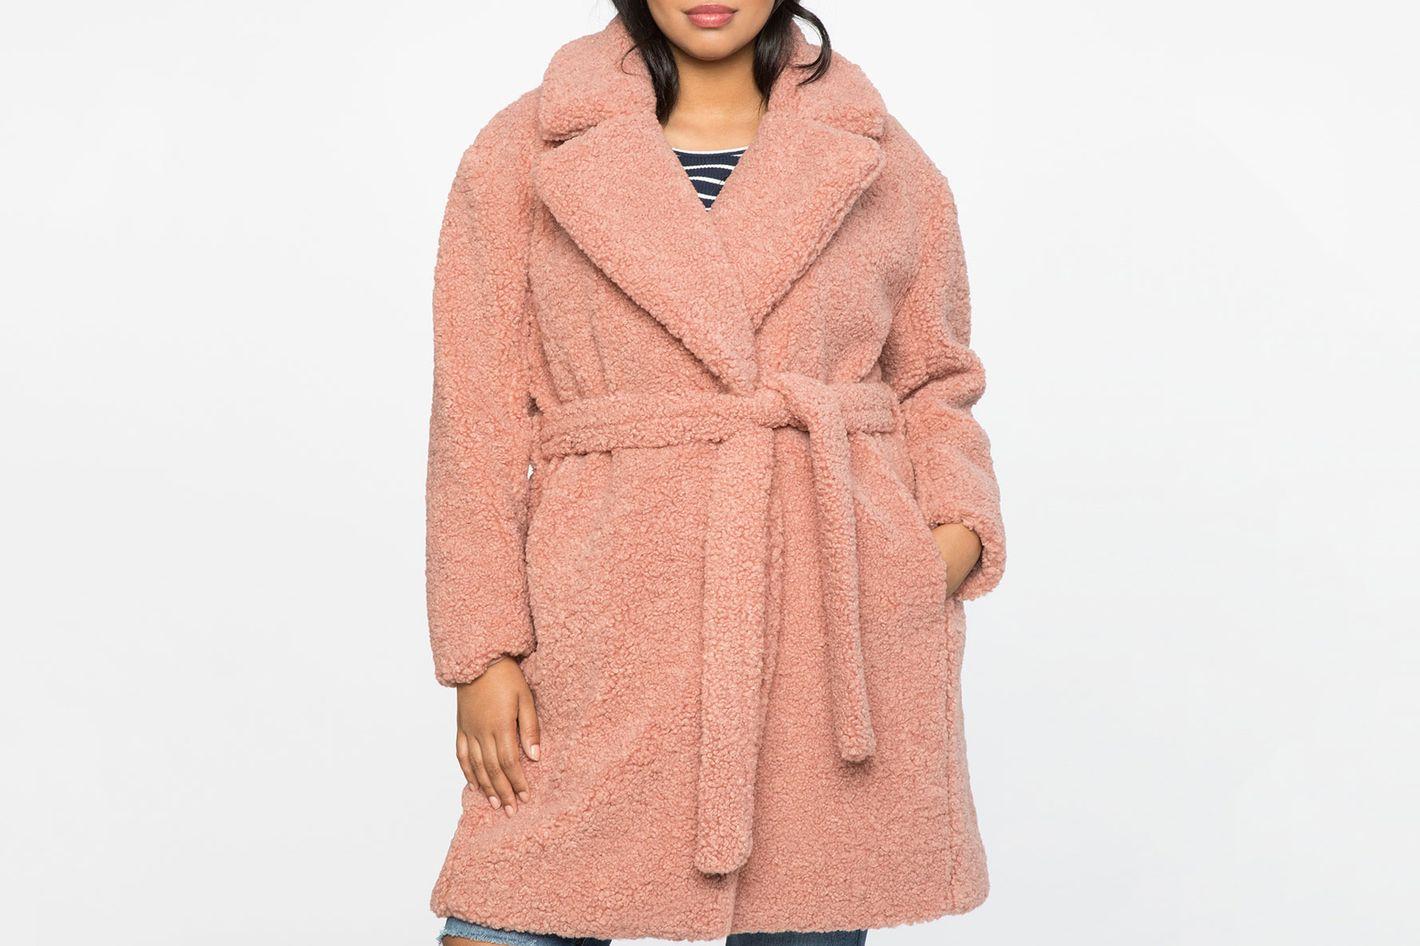 Boucle Teddy Coat